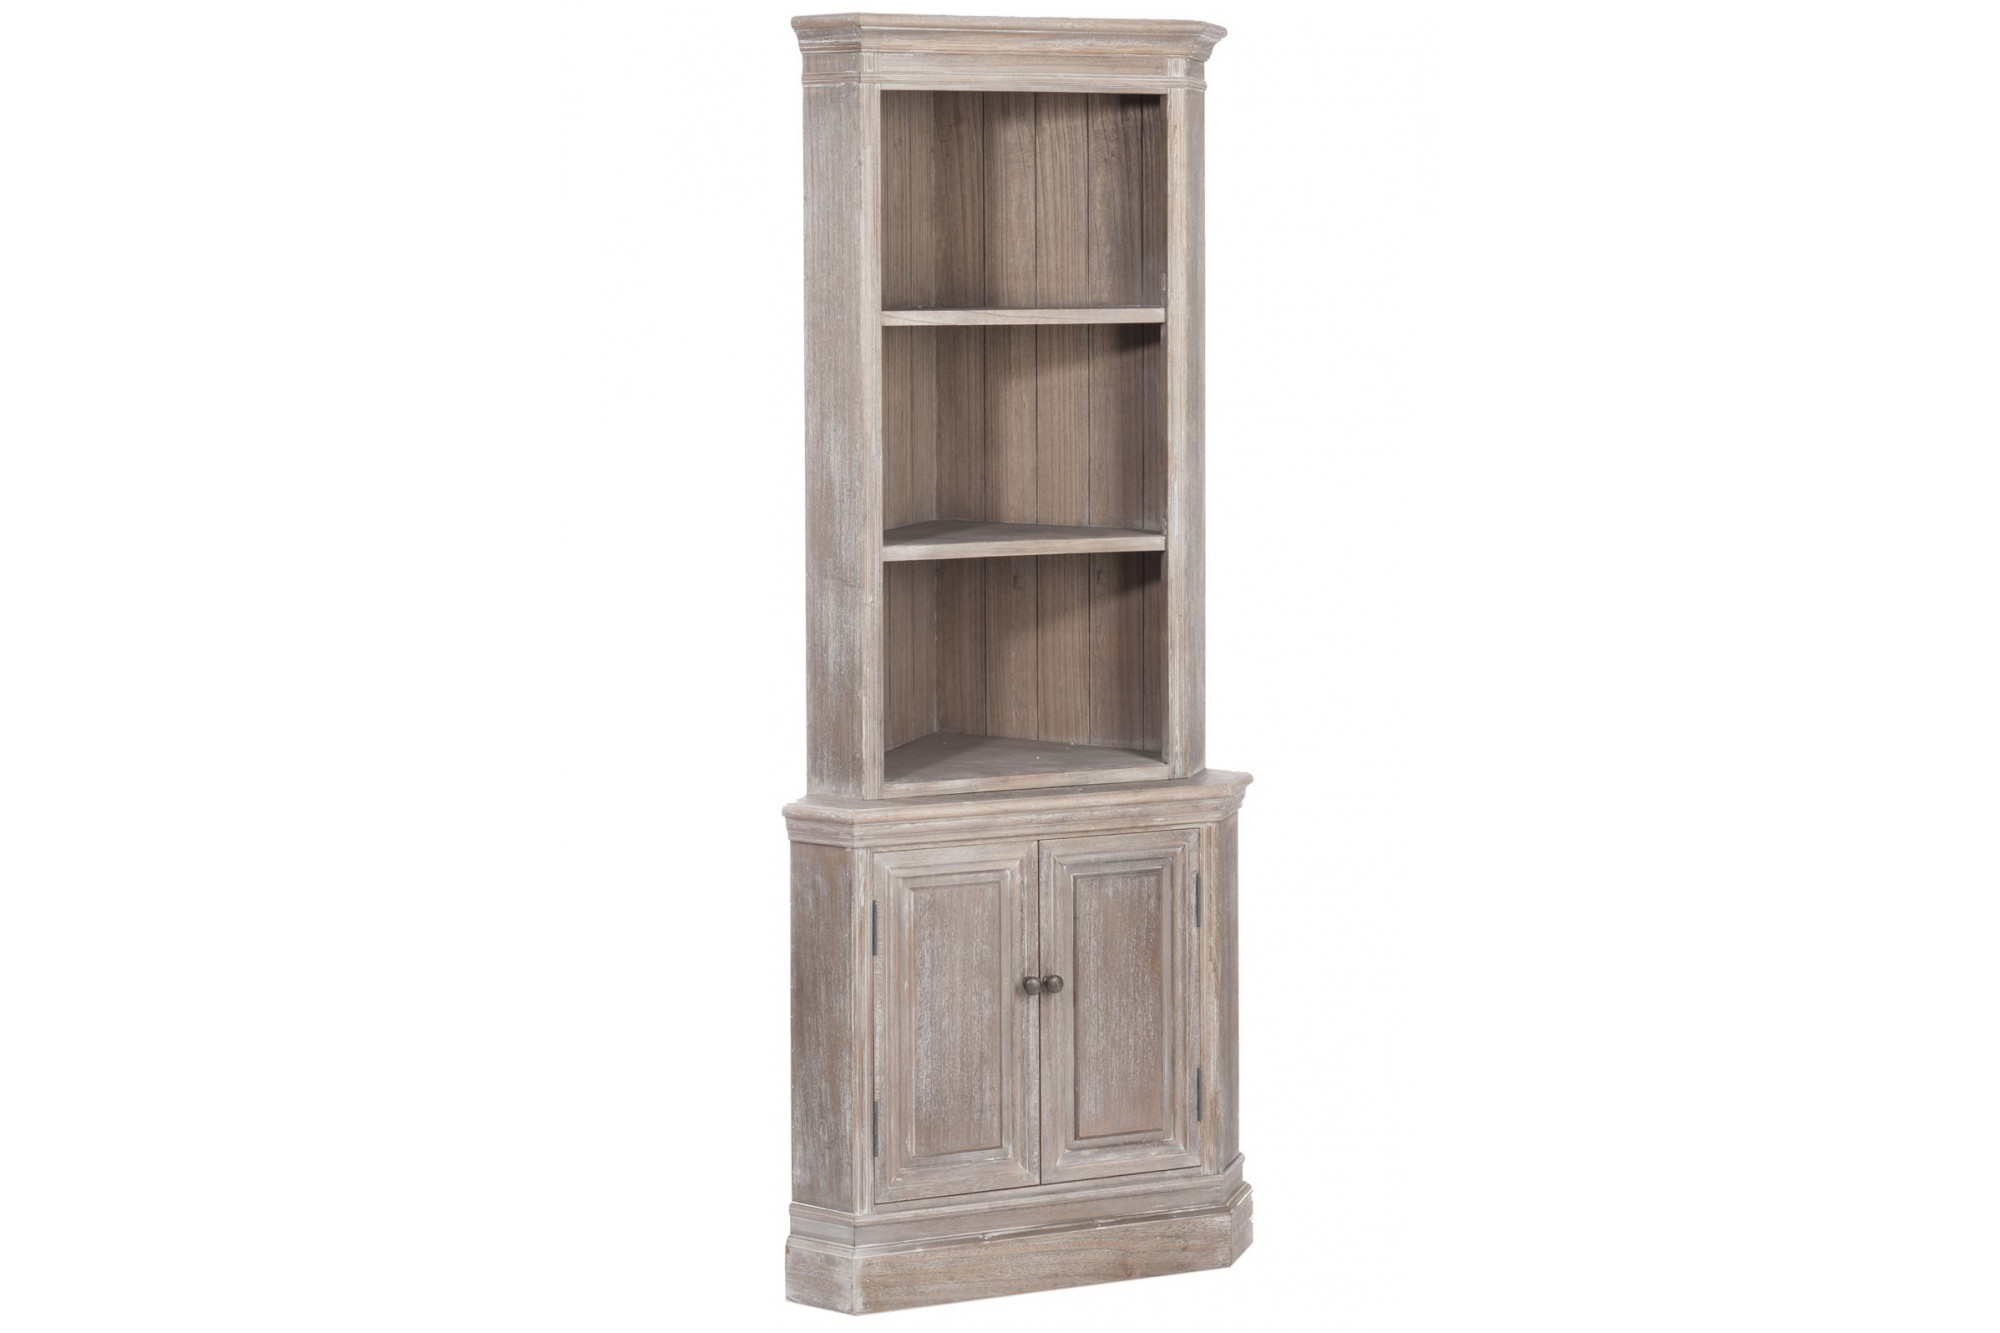 vaisselier d 39 angle en bois hellin. Black Bedroom Furniture Sets. Home Design Ideas